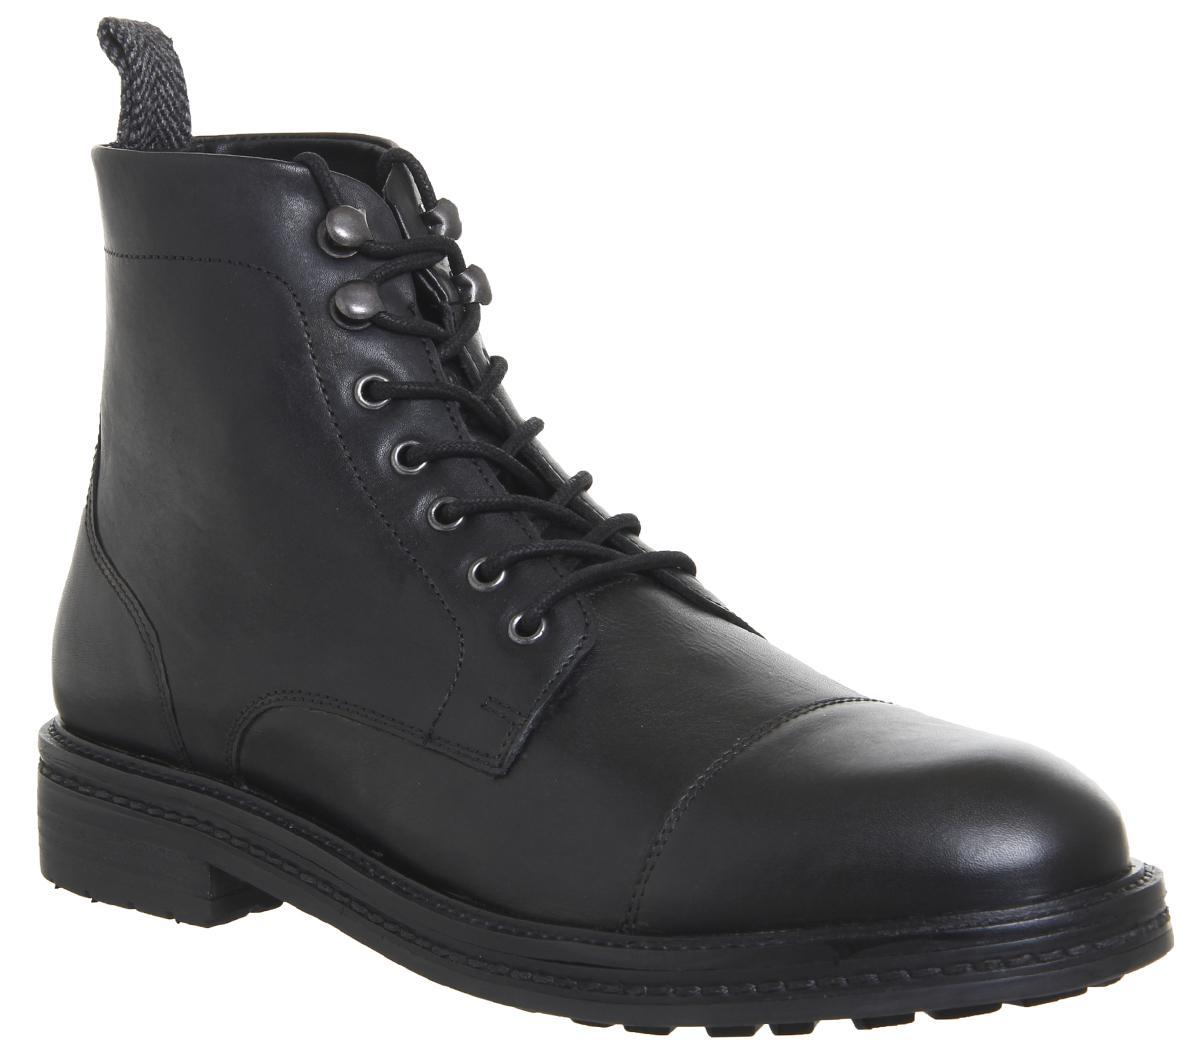 Wolf Toe Cap Boots